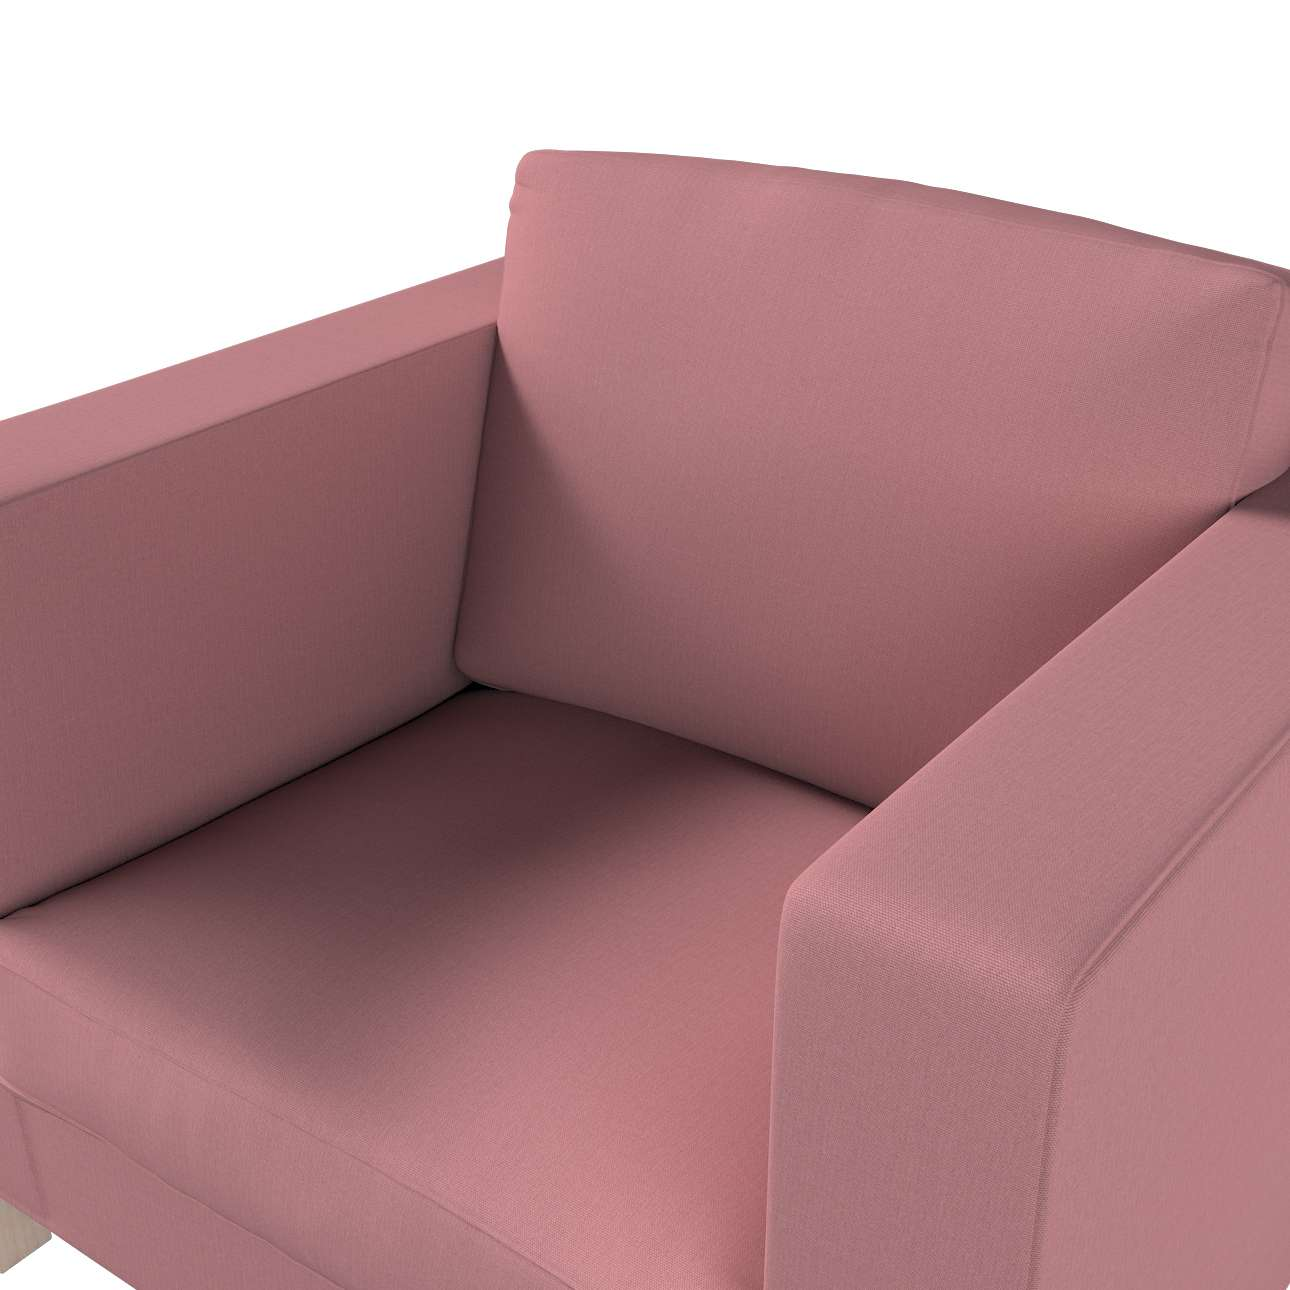 Karlanda fotelhuzat rövid a kollekcióból Cotton Panama Bútorszövet, Dekoranyag: 702-43